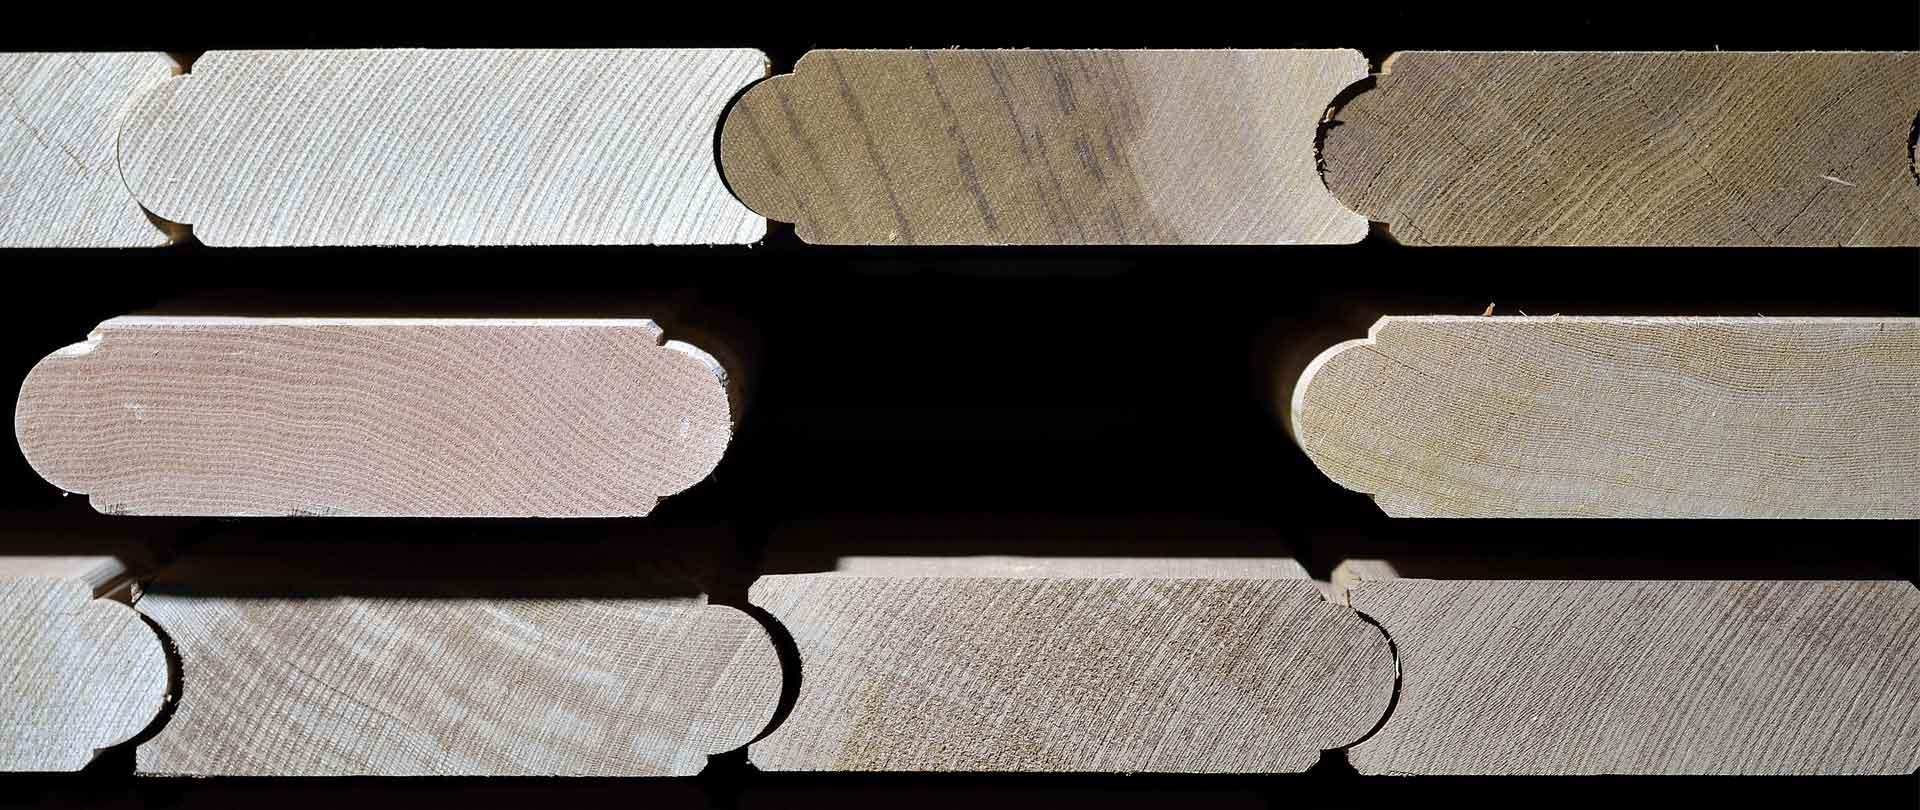 Atelier fabrication bois spa sauna